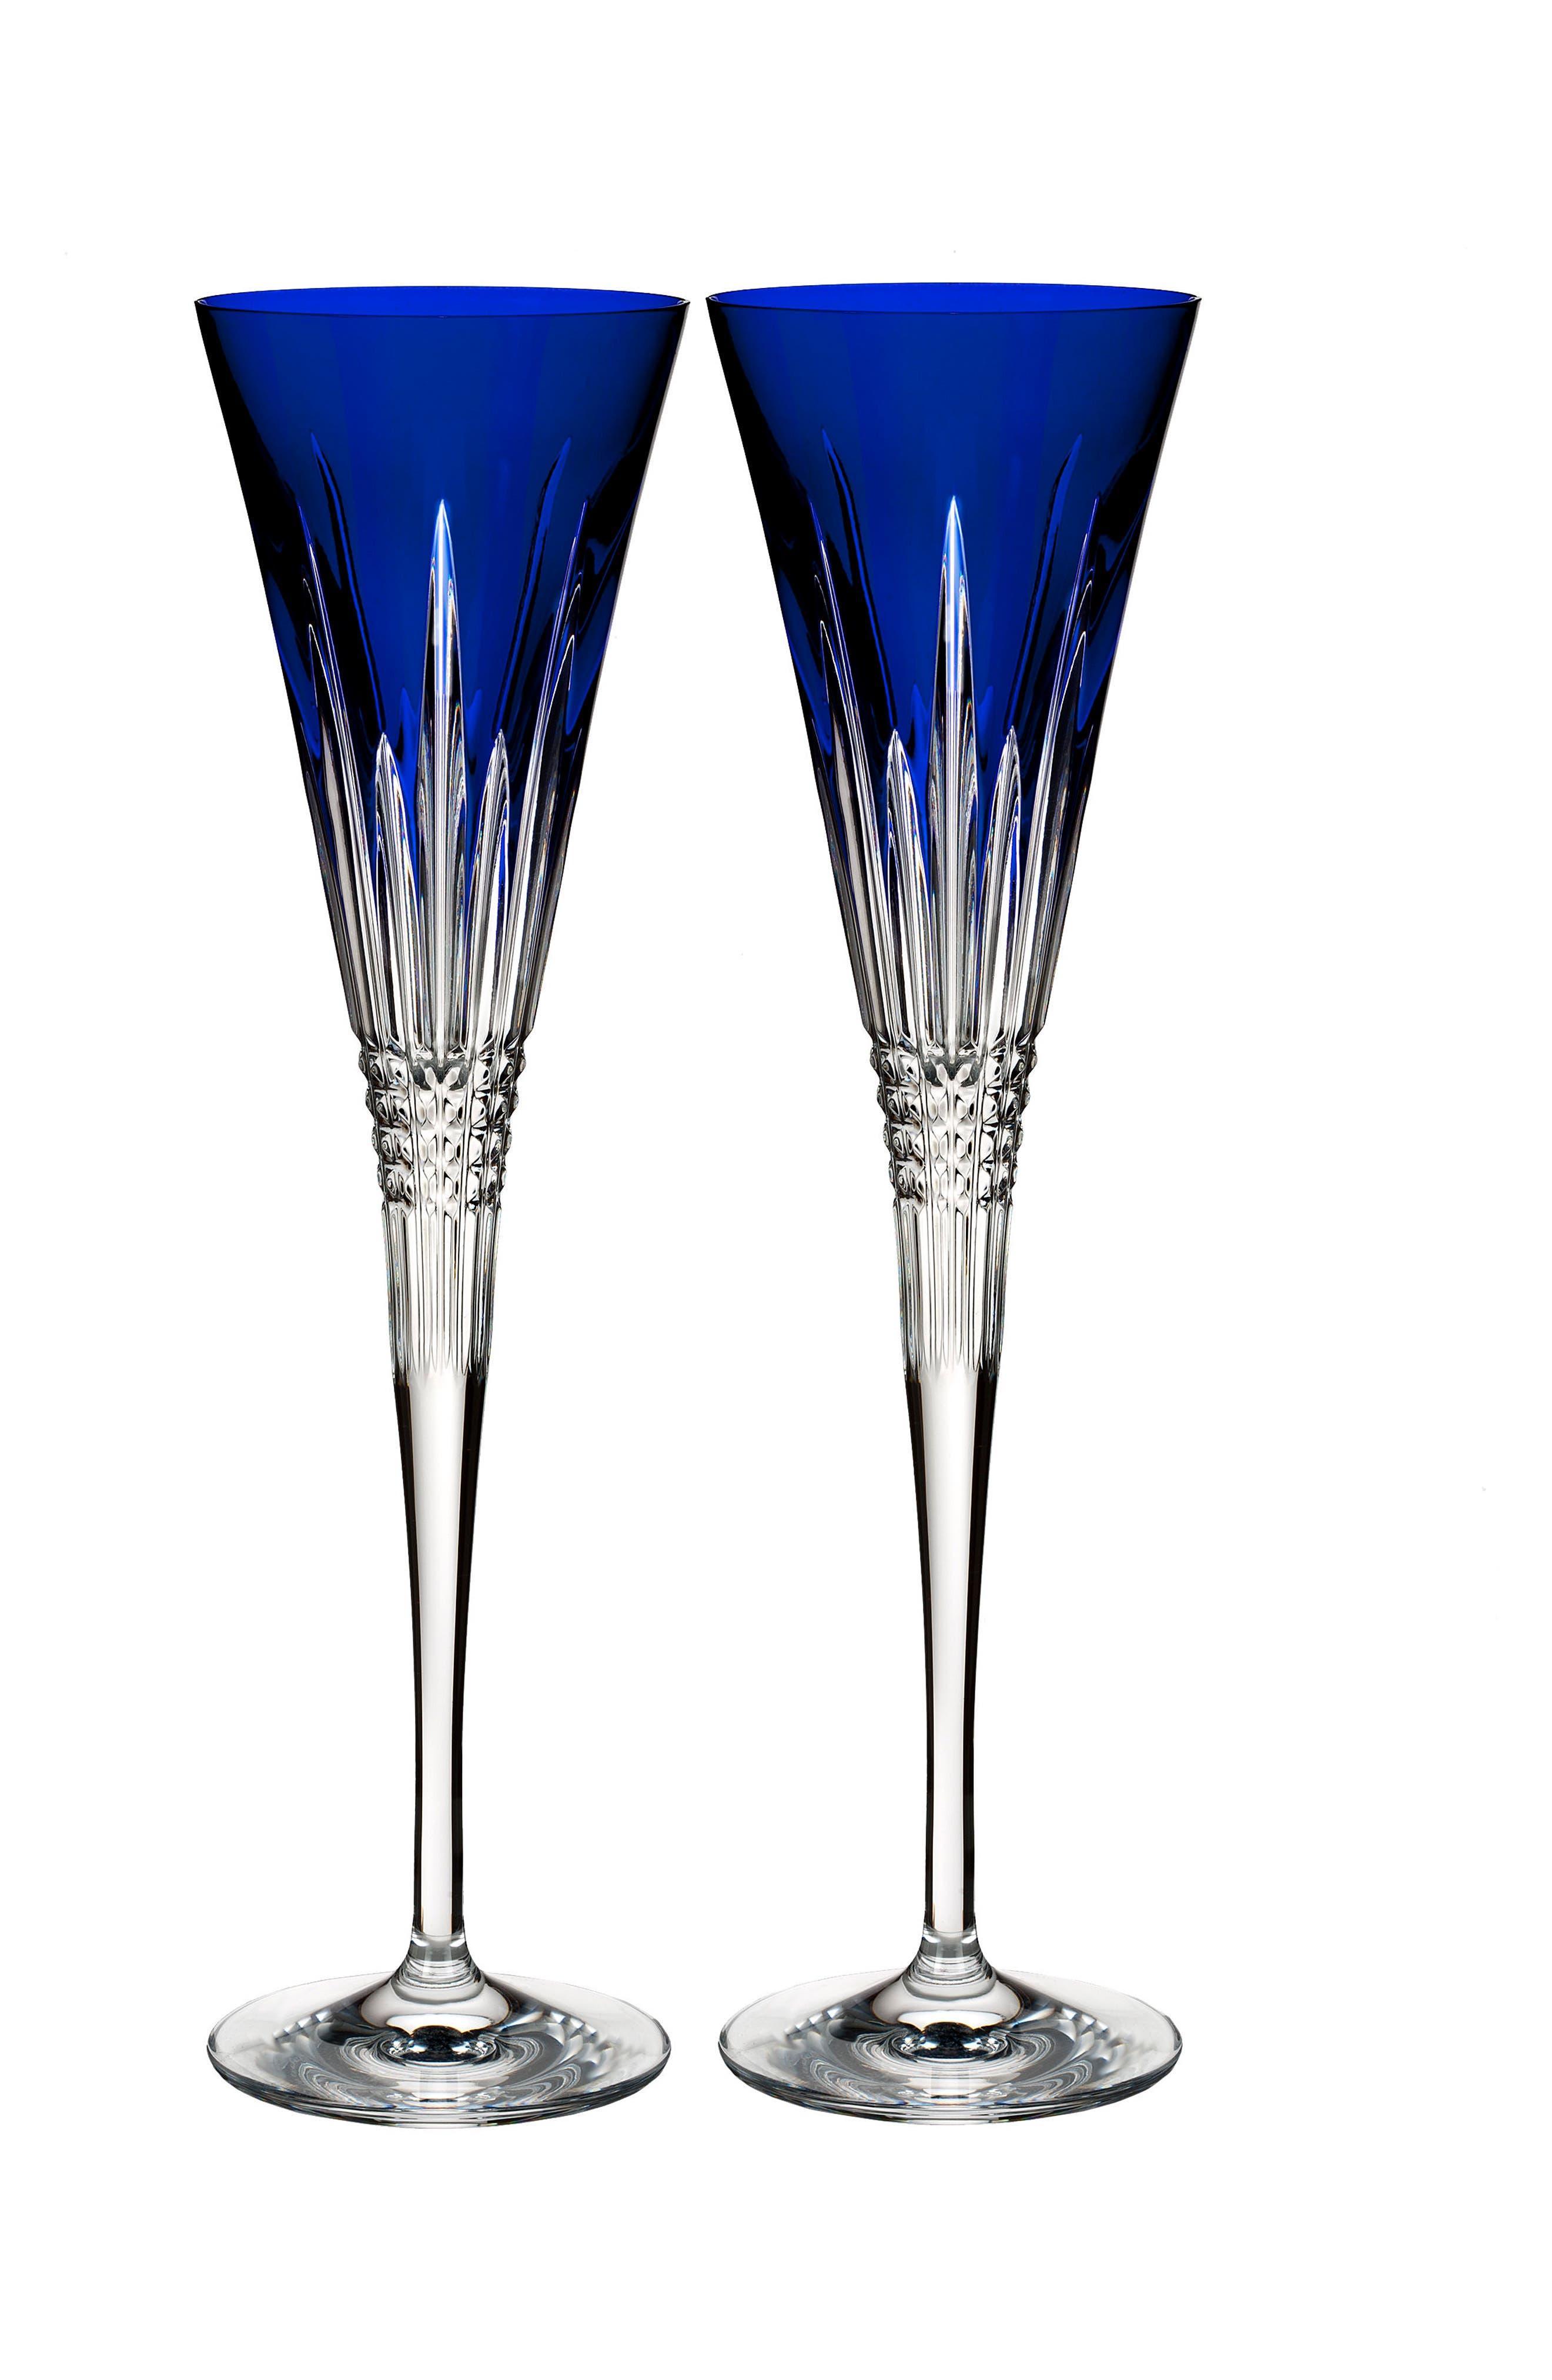 Main Image - Waterford Lismore Diamond Set of 2 Cobalt Toasting Flutes